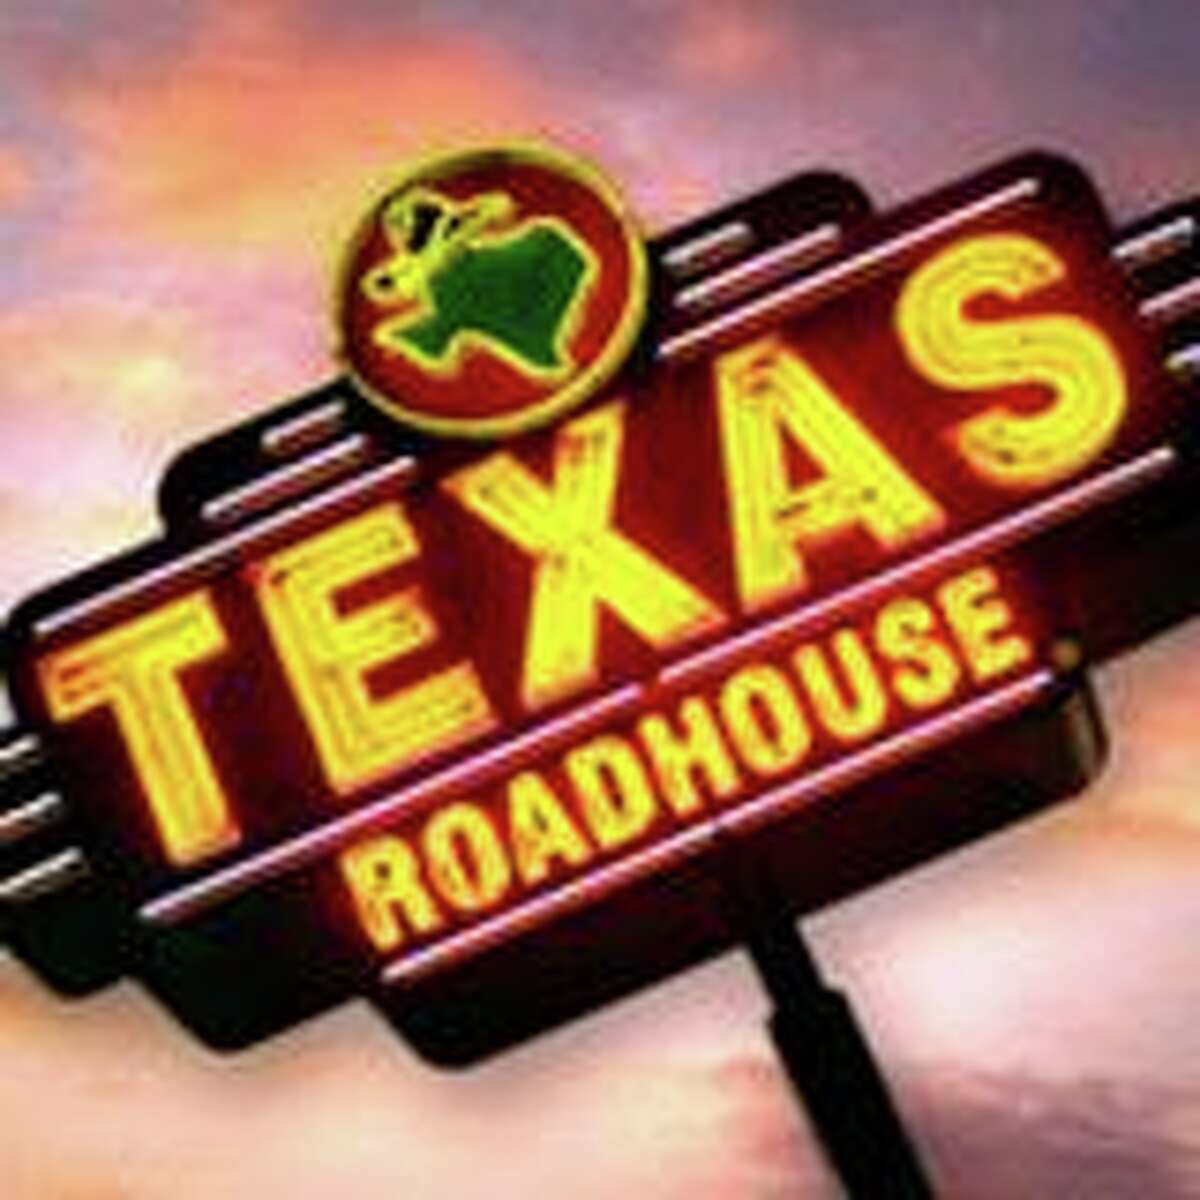 Silver: Texas Roadhouse 4512 West Loop 250 North, Midland, TX 79707